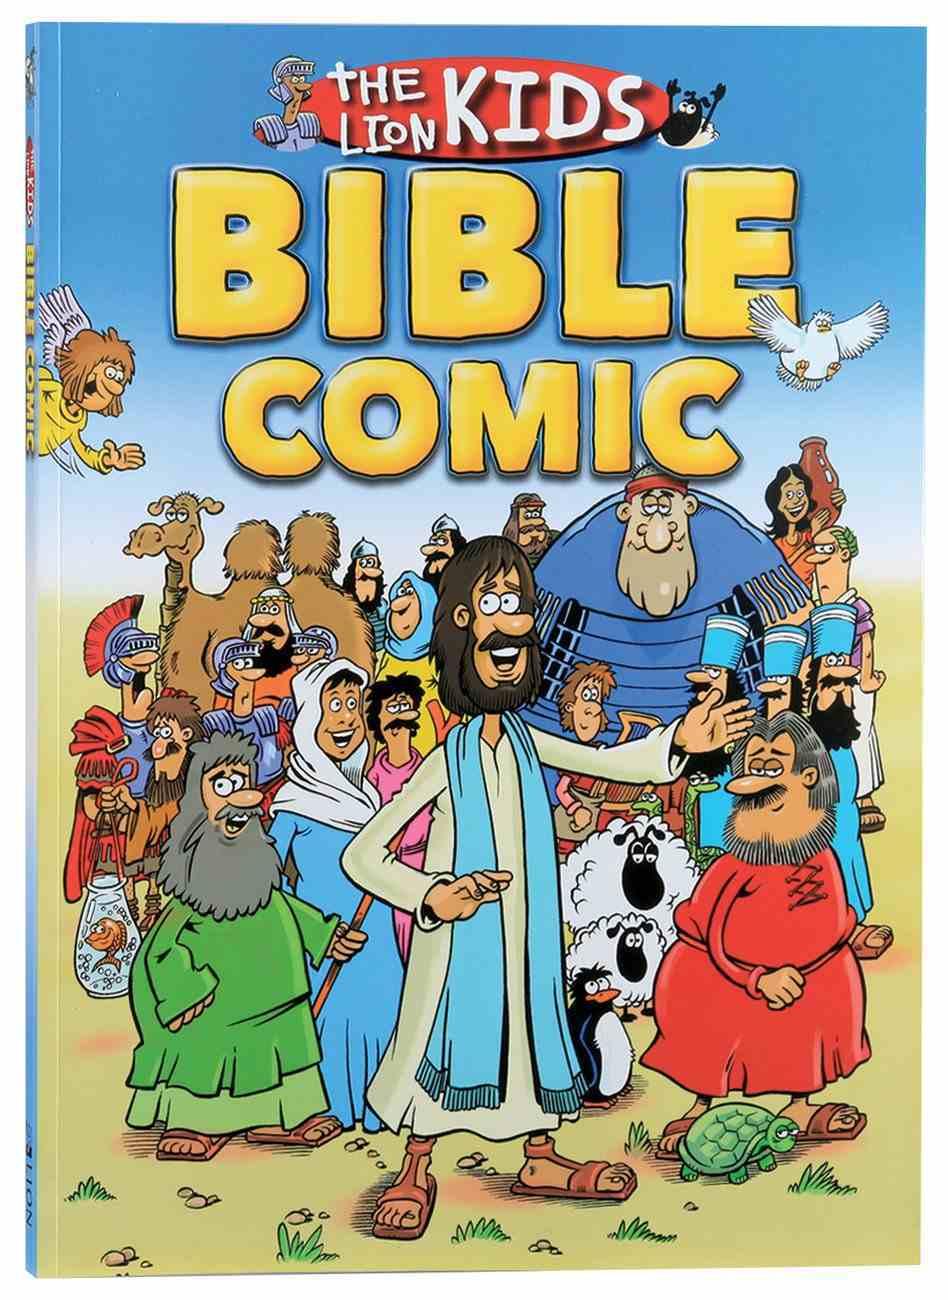 The Lion Kids Bible Comic Paperback